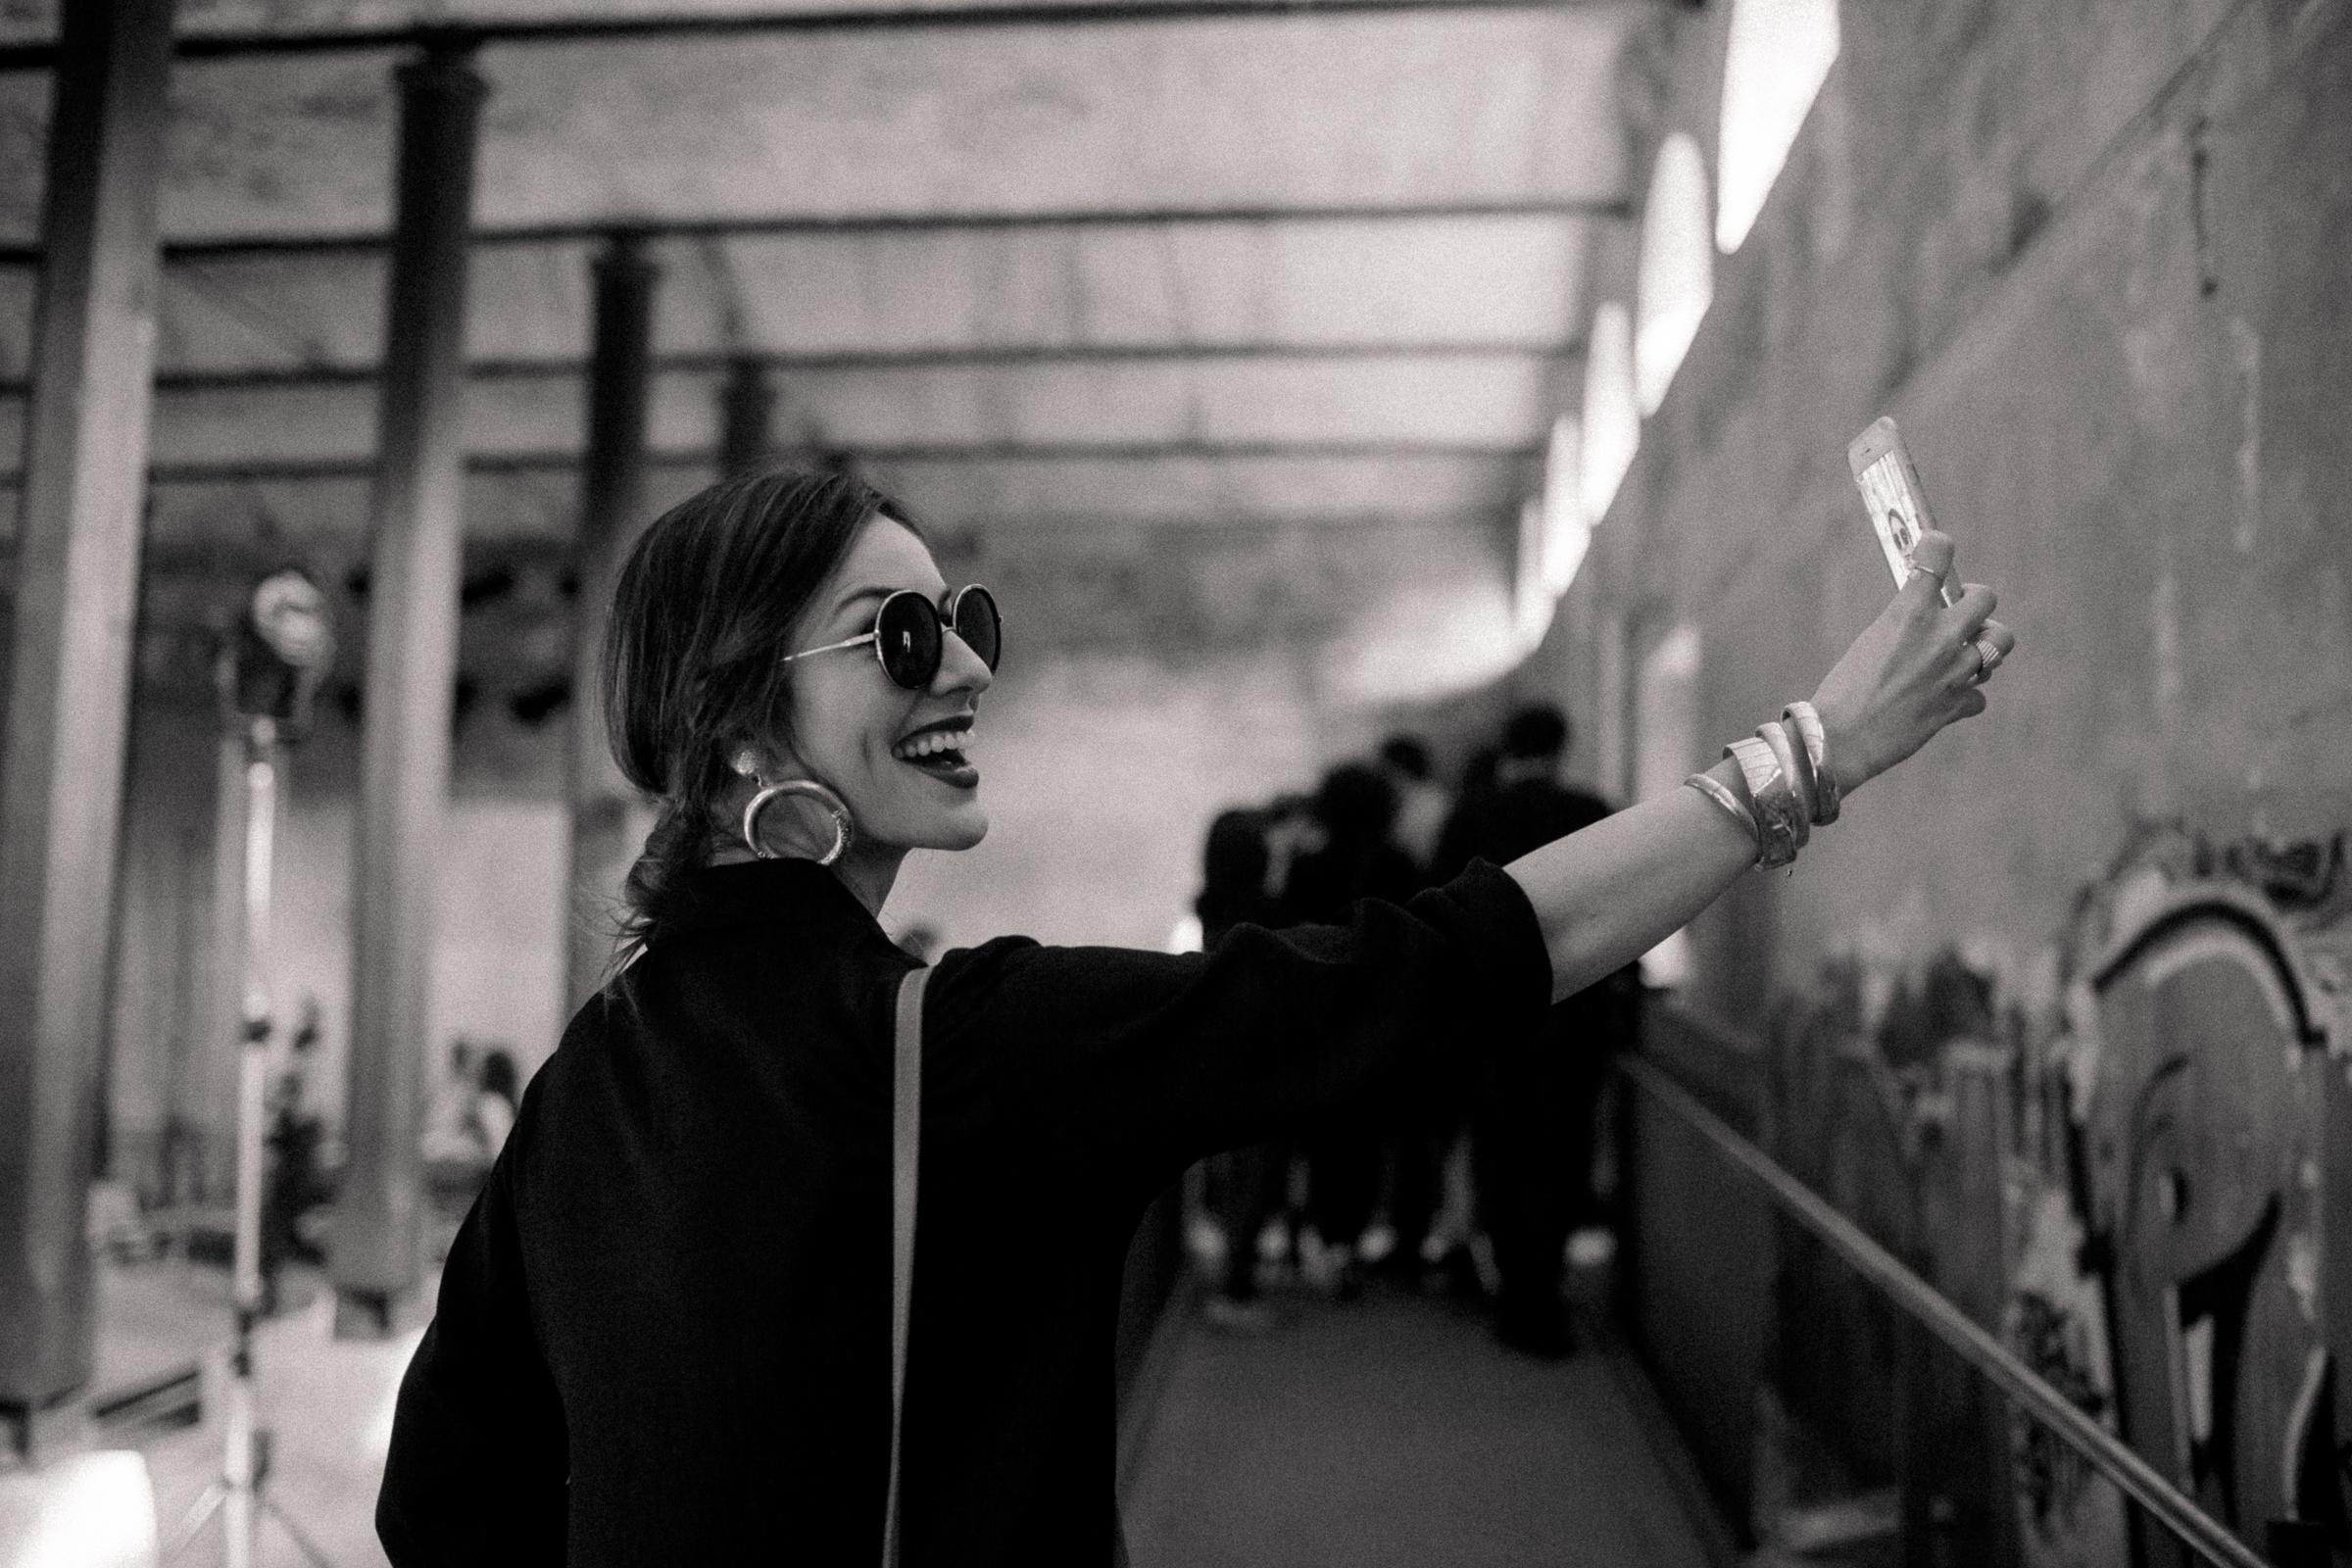 Eldridge_Edit_Anna_E_Cottrell_Fashion_Blogger_Tulip_Louise_MGB_Photo_Mercedes_Benz_Fashion_Week_Australia_Kitx_Presentation_Resort_Shop_Lola_Boutique_Chic_12.jpg